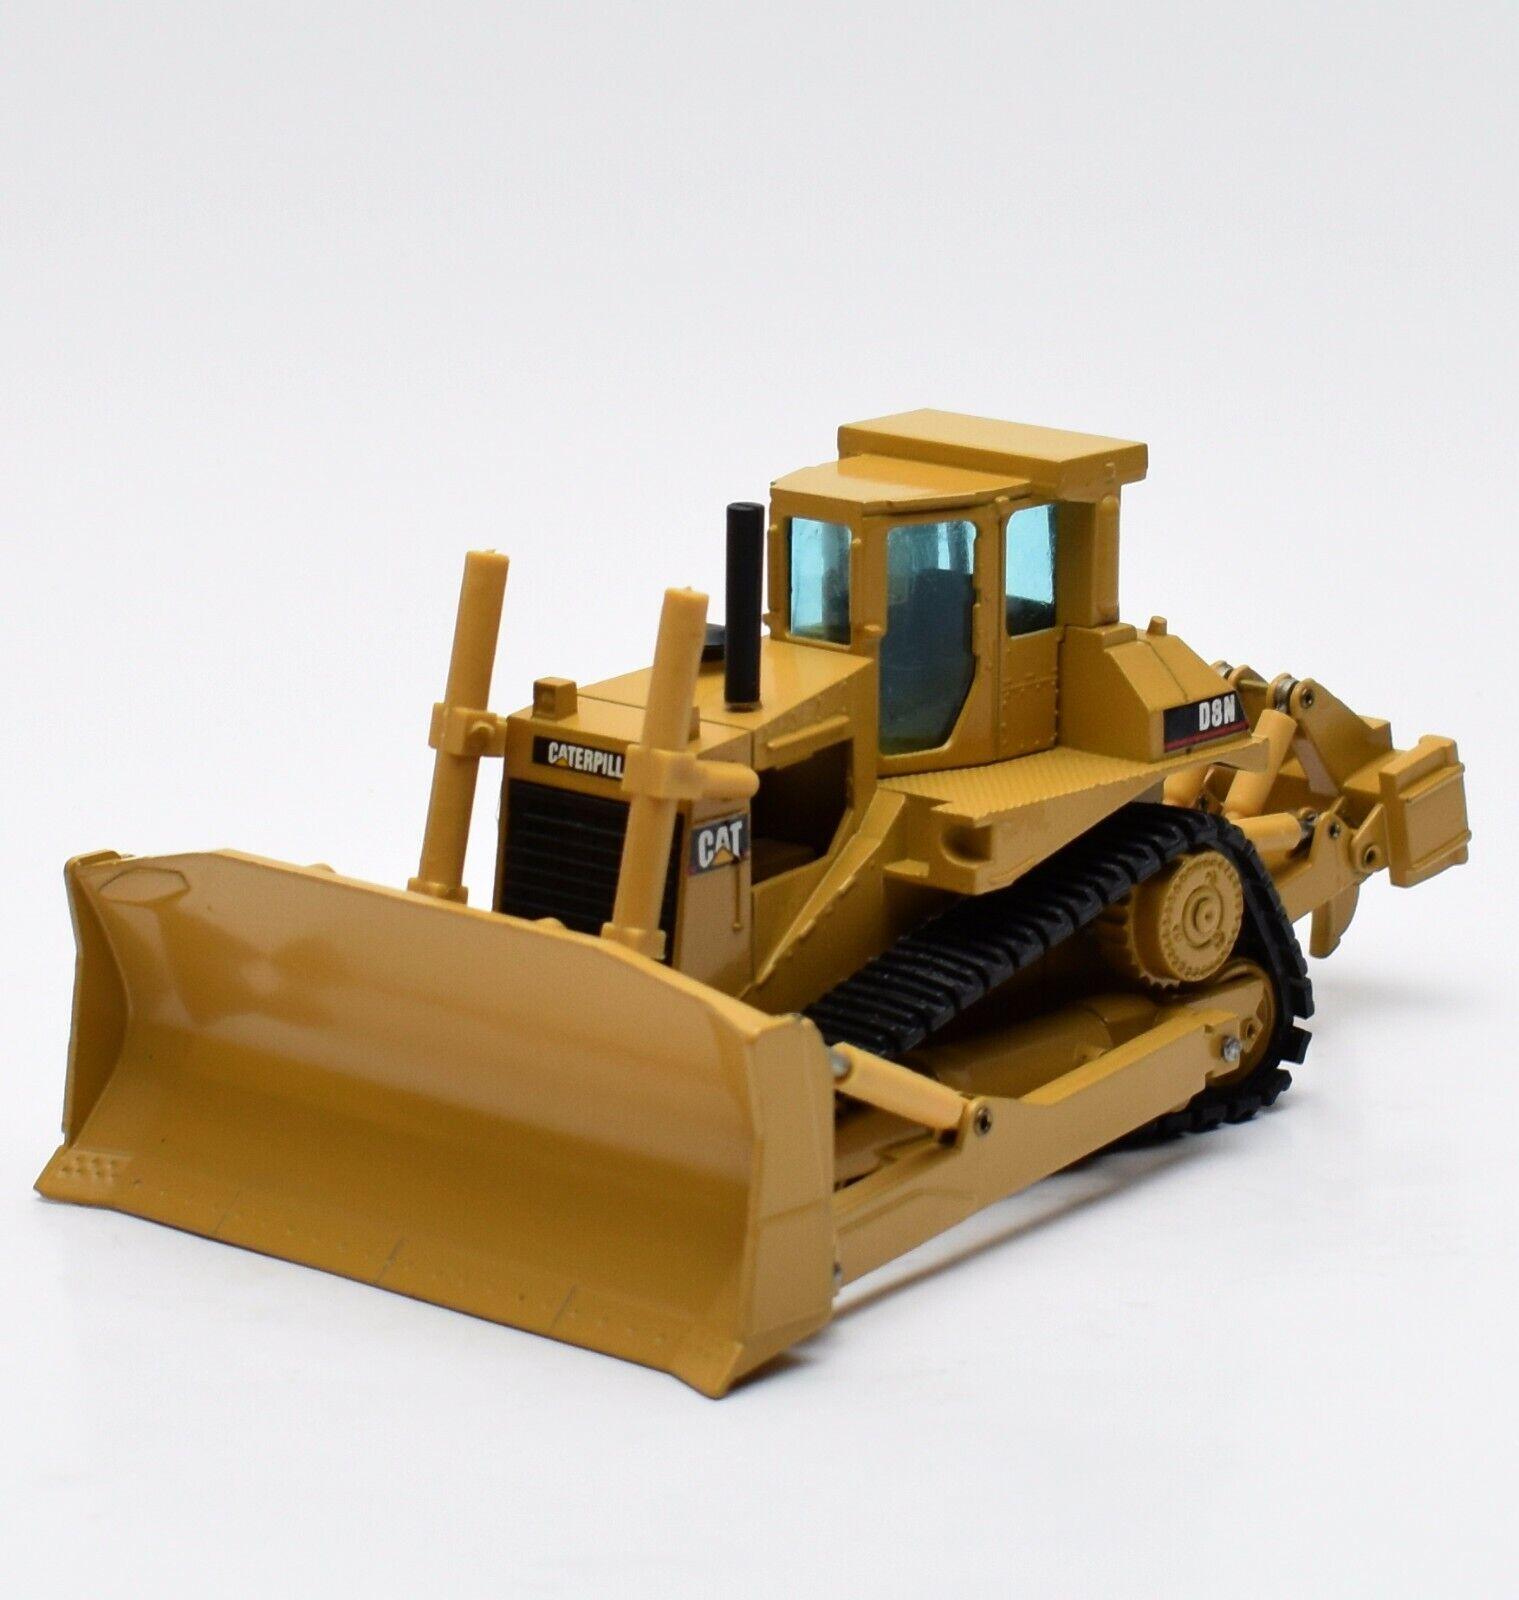 NZG nº 233 Cat d8n kettendozer oruga track tractor caterpillar, OVP, 1 50, x020